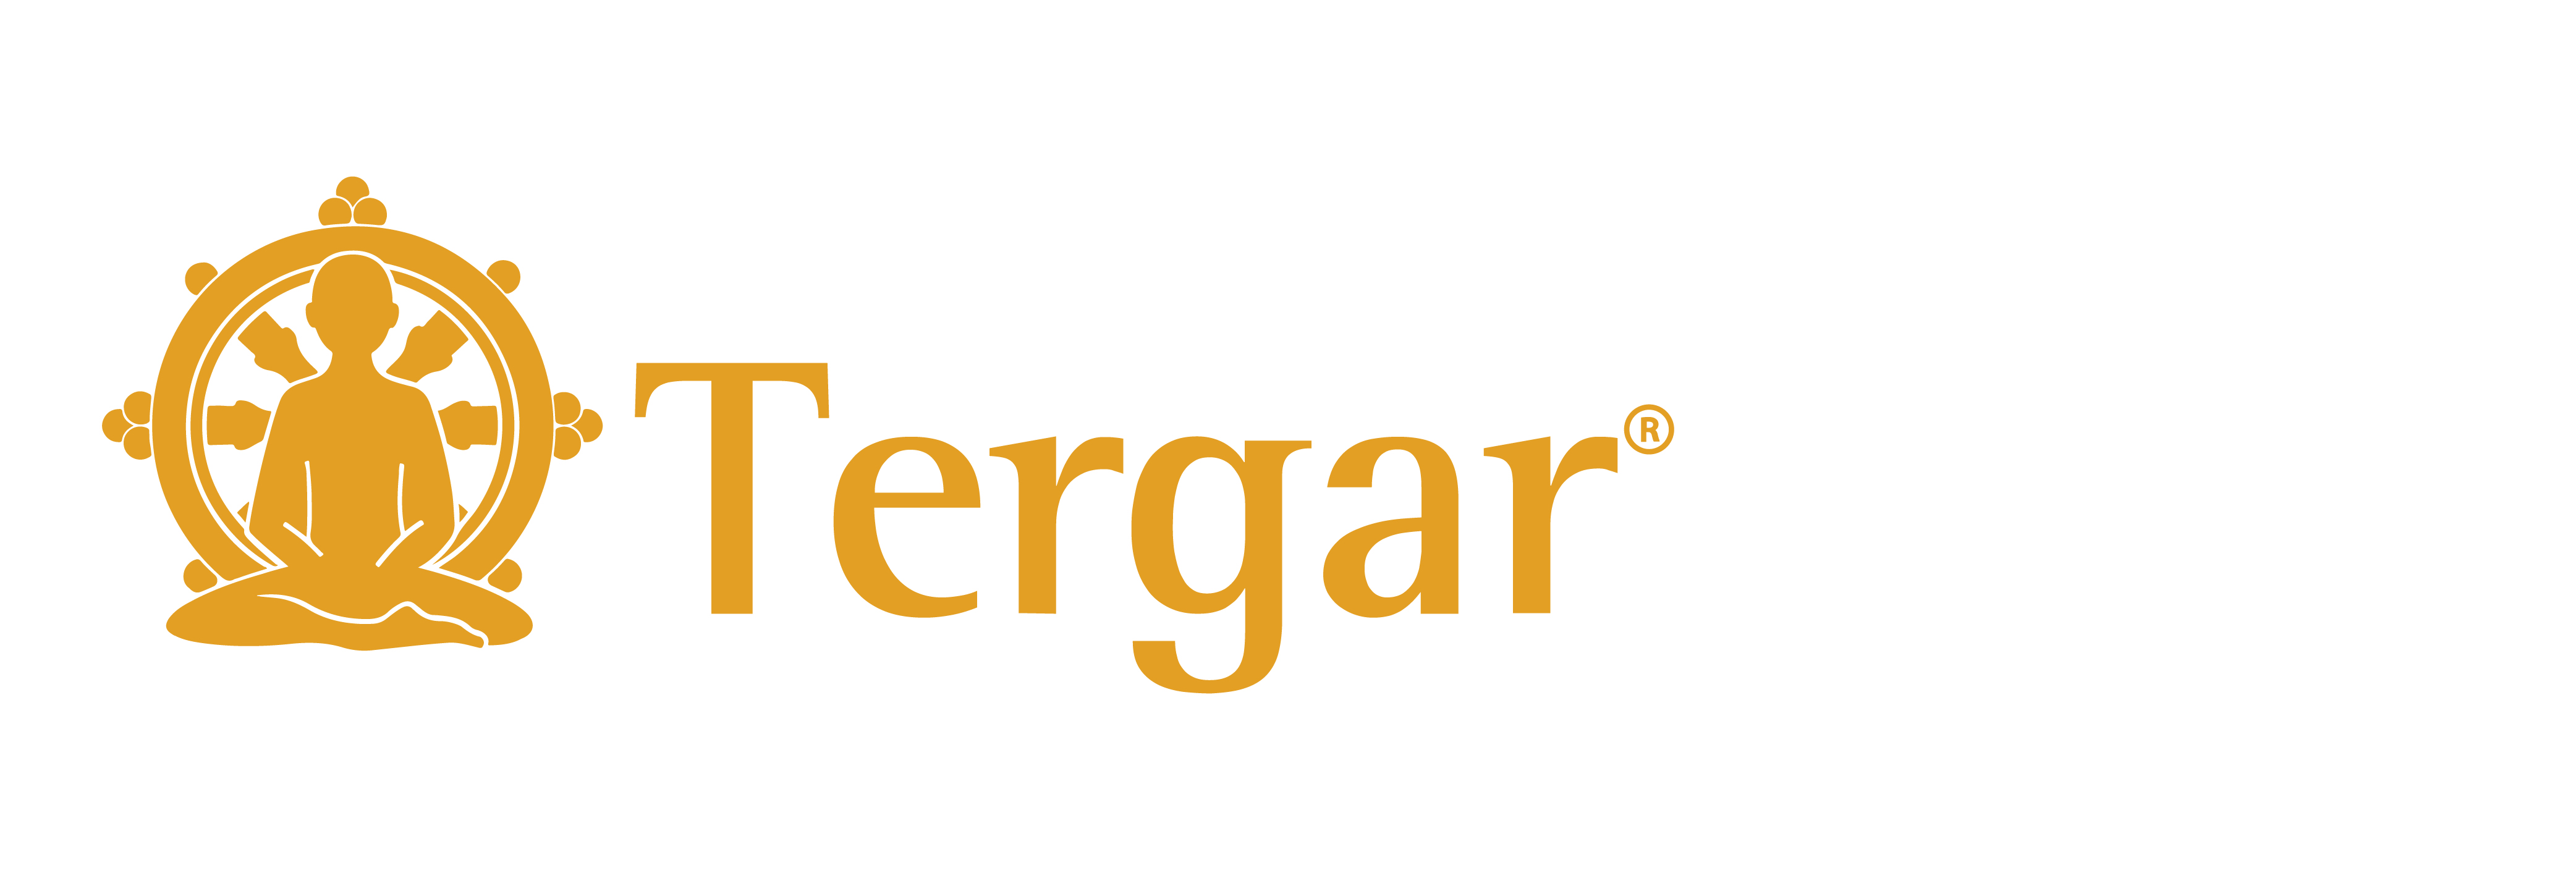 cropped-logo-tergar-home.jpg